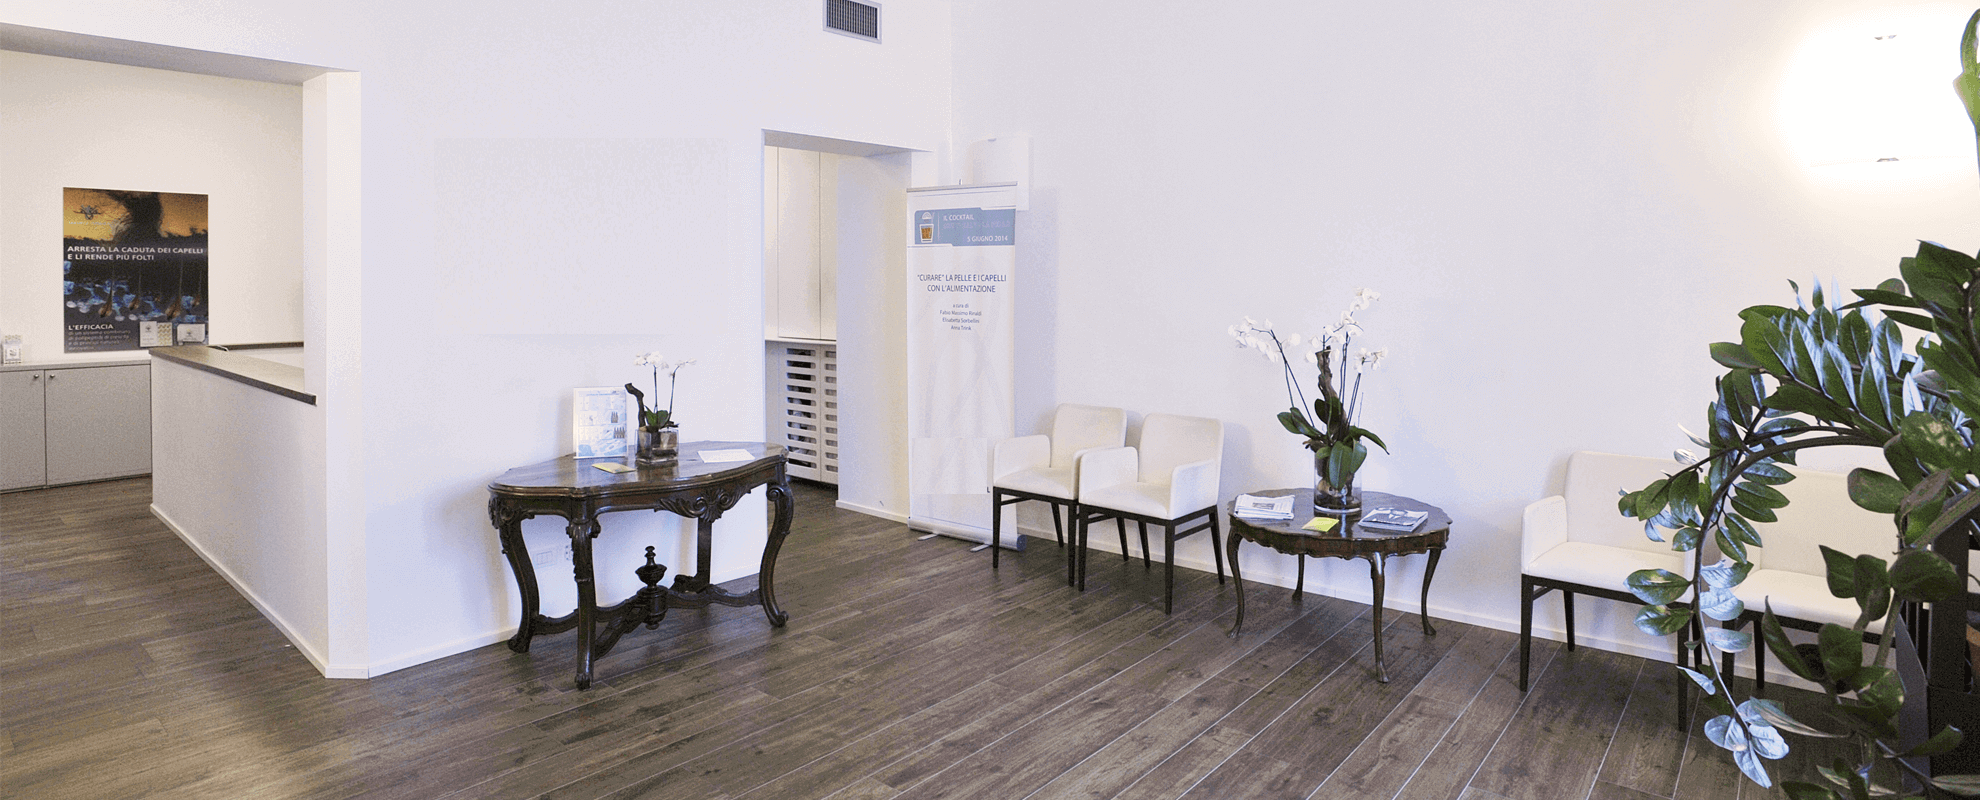 Studio Medico Sorbellini viale Bianca Maria 19